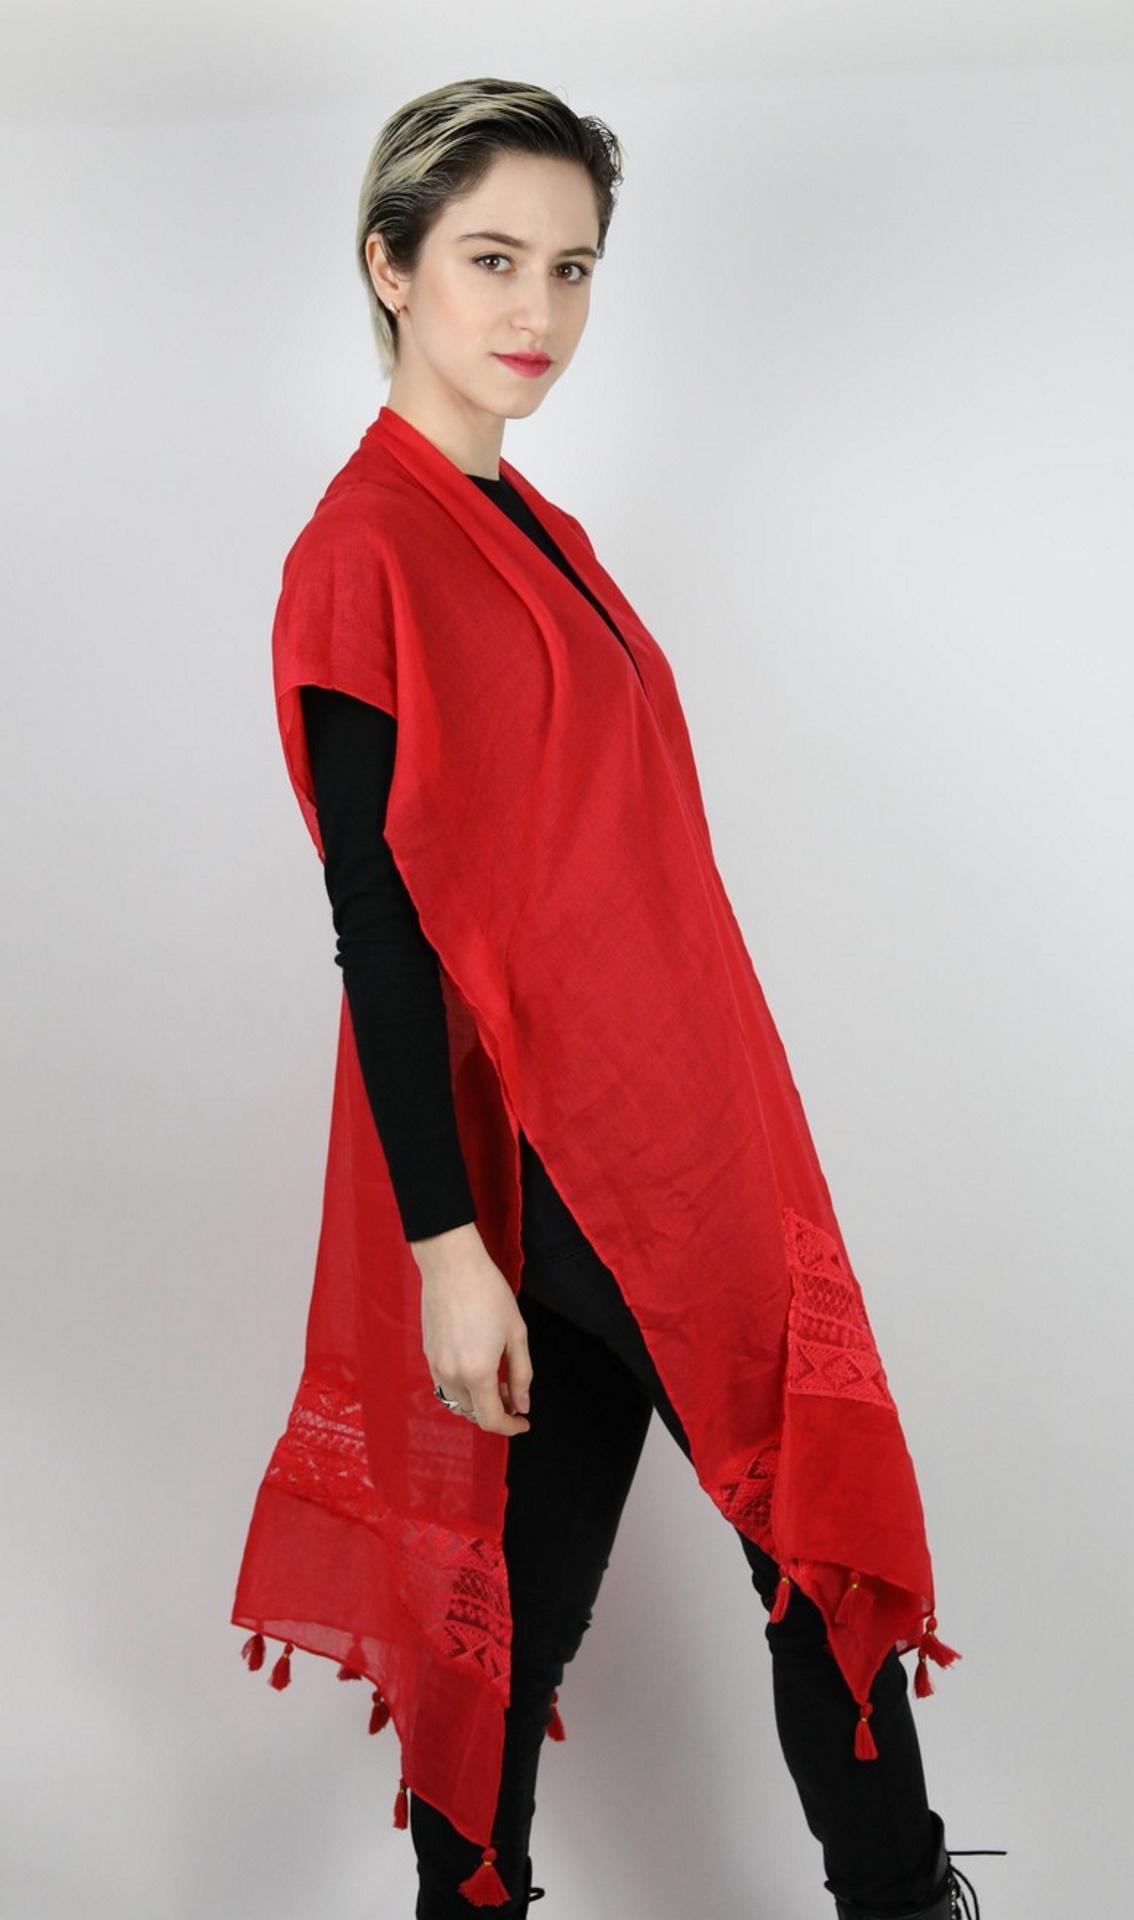 CLOTHES179 STOLA DONNA FOULARD CARDIGAN COPRISPALLE 3 1stAmerican elegante stola da donna foulard cardigan coprispalle